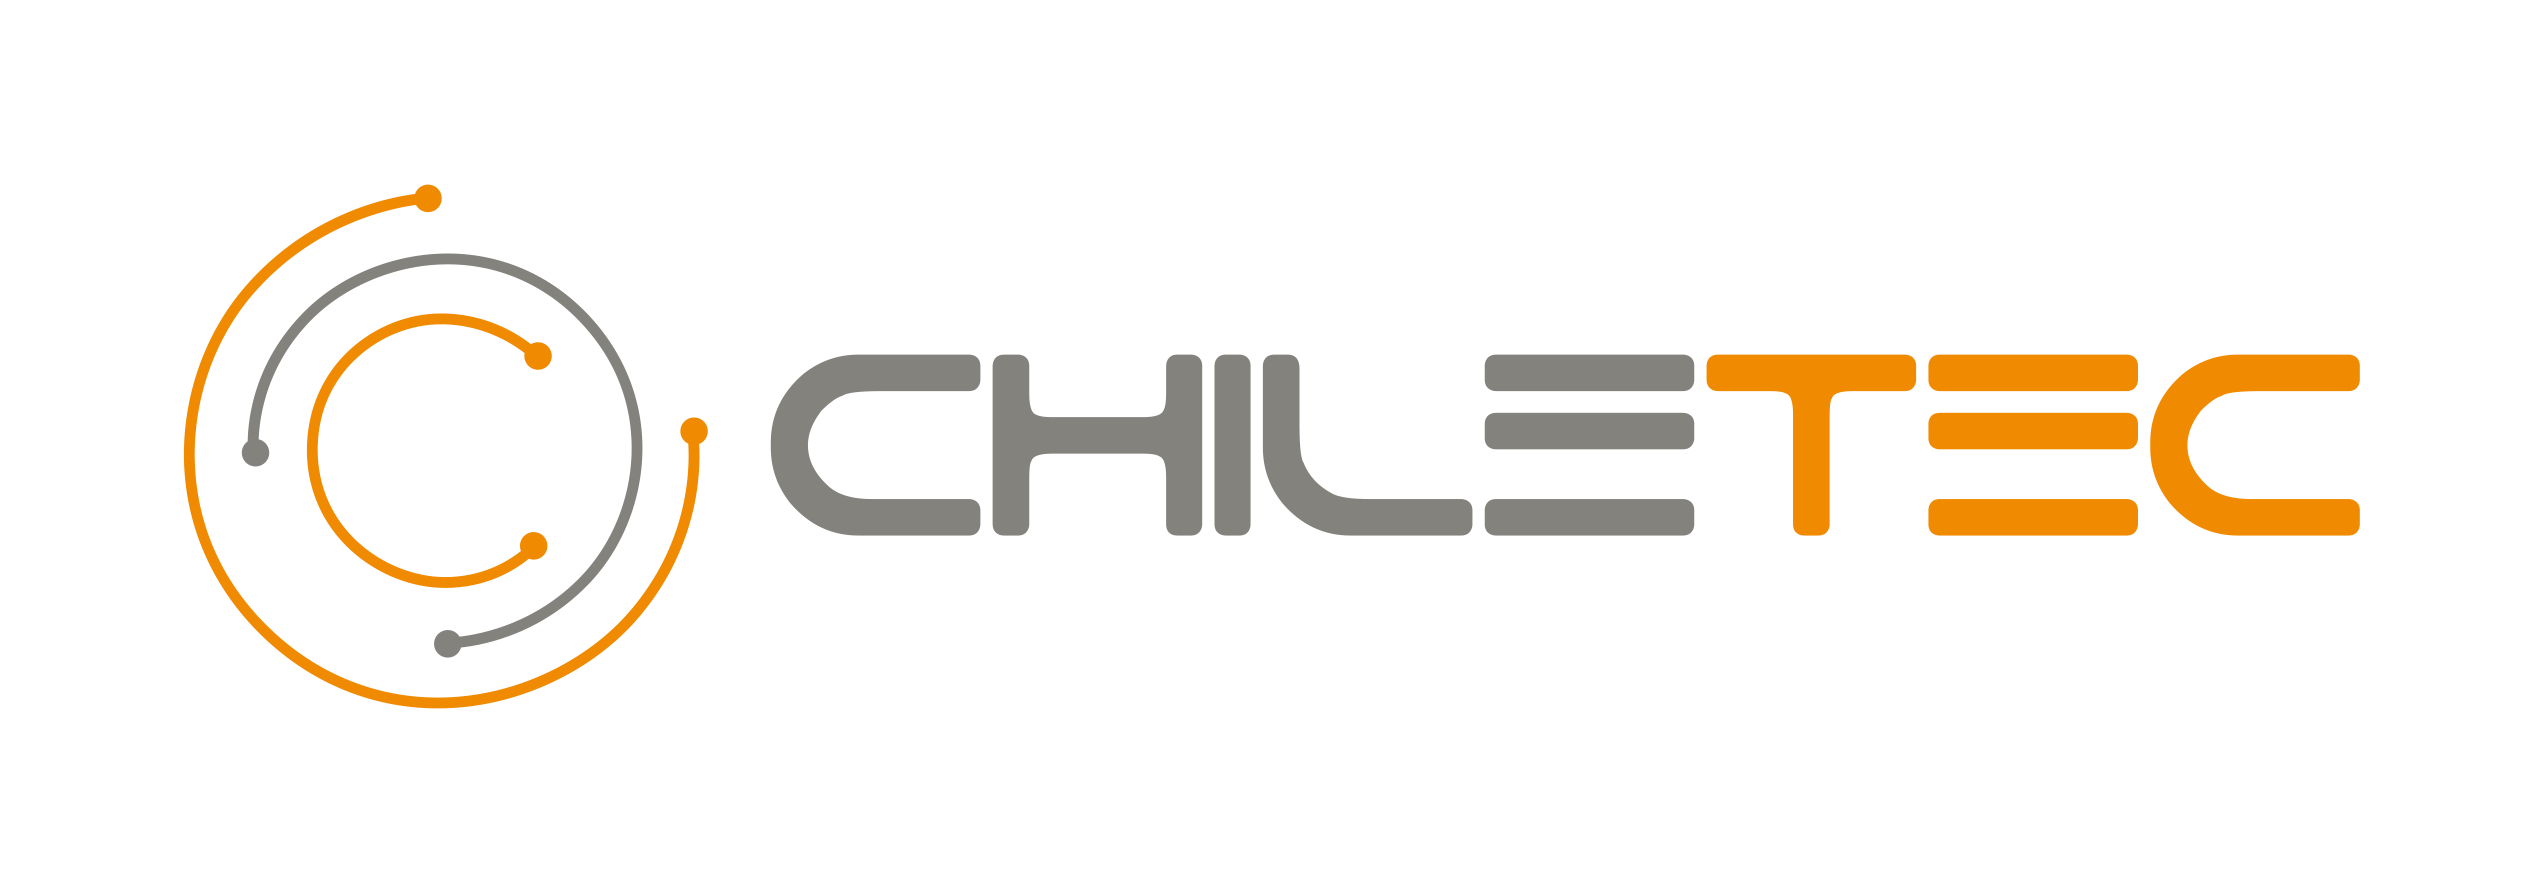 Chiletec